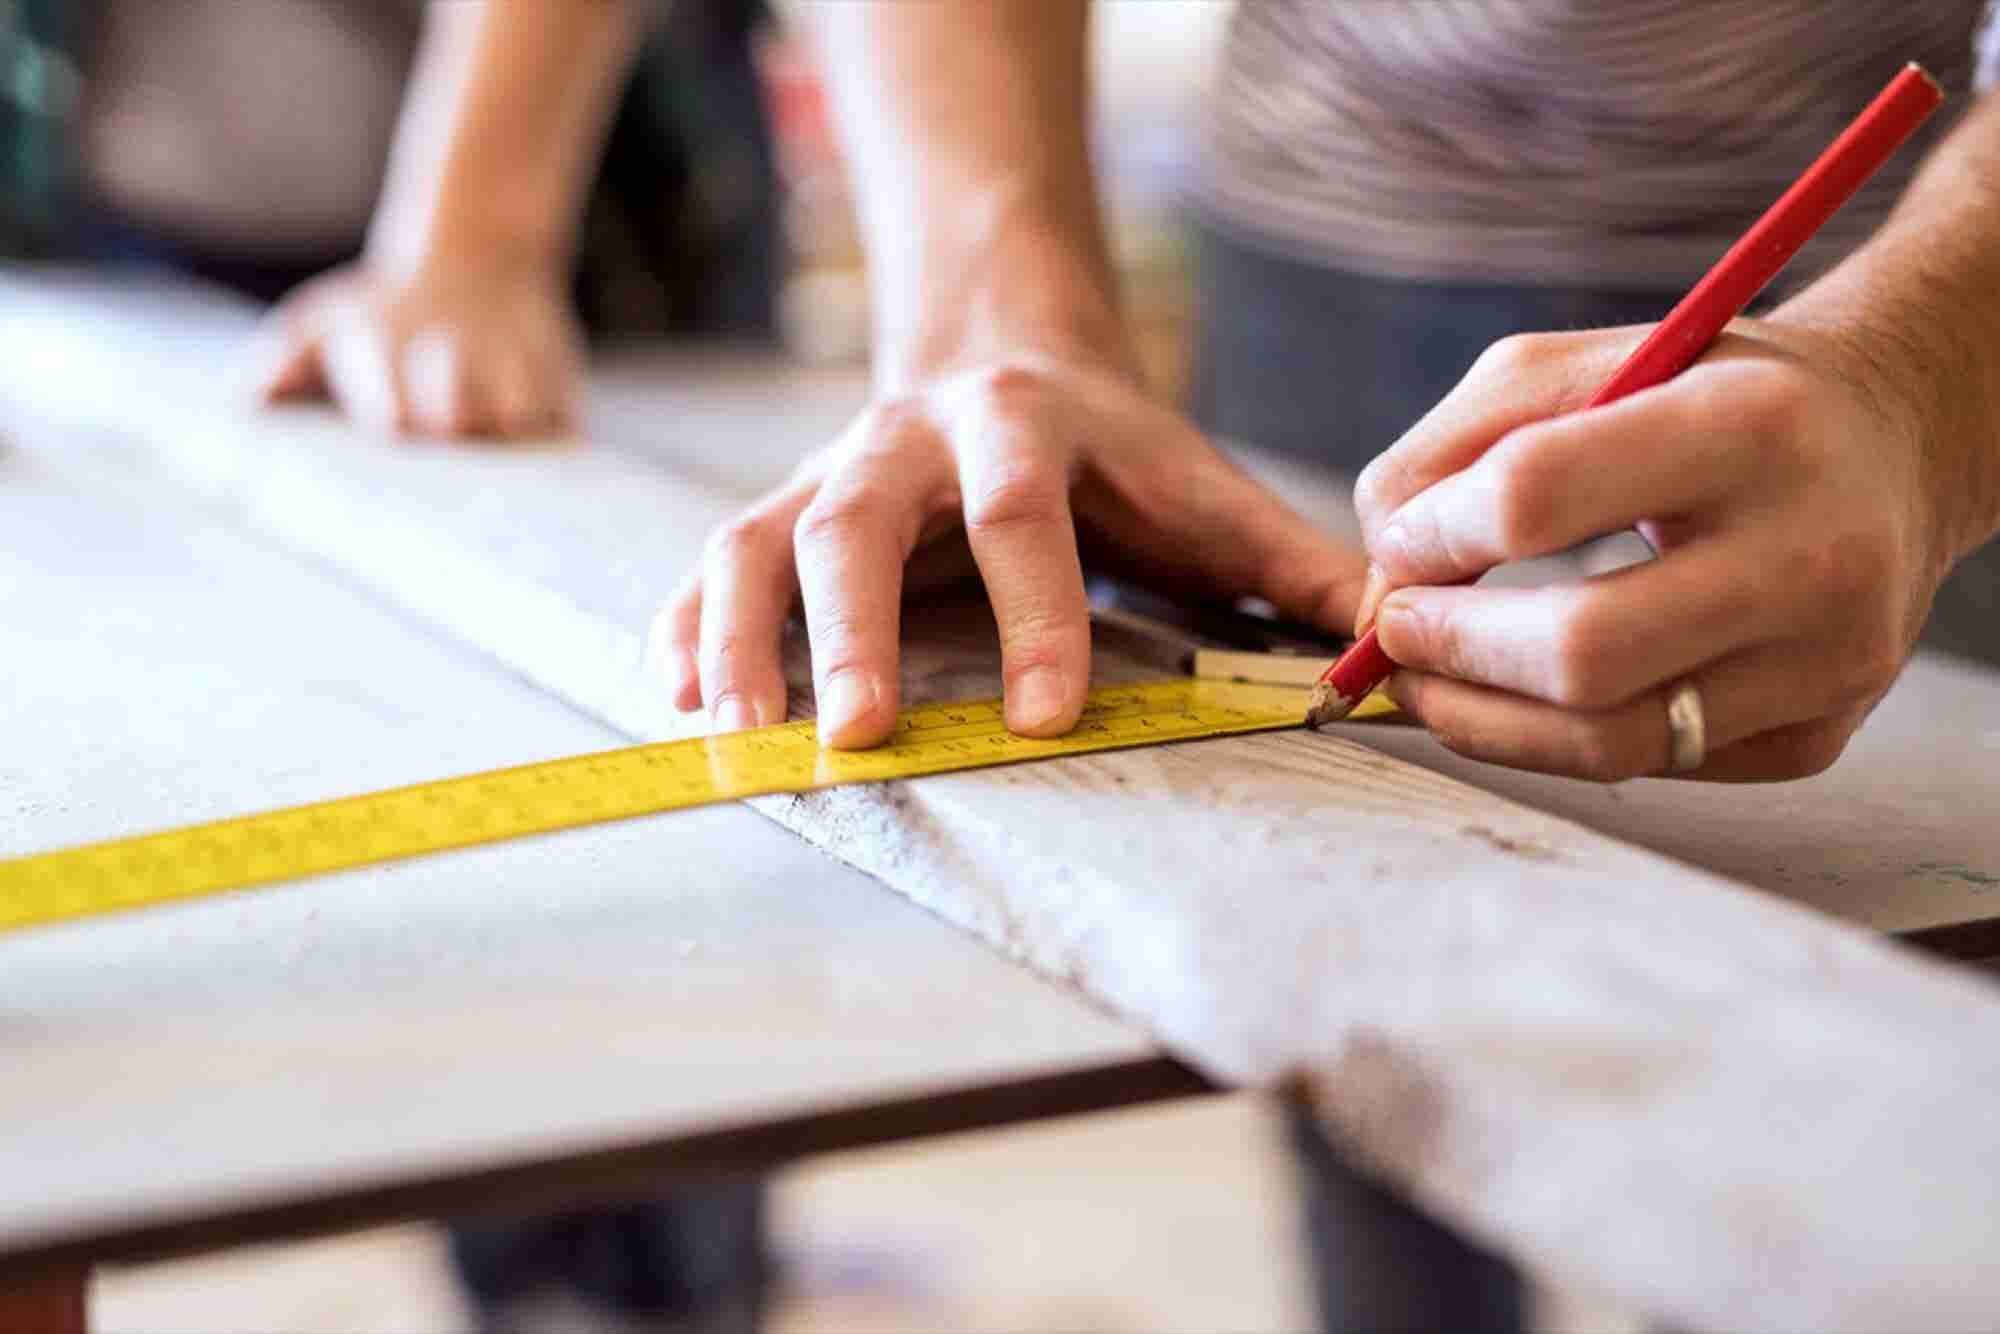 Como aumentar la plusvalía de tu vivienda con Mejoravit